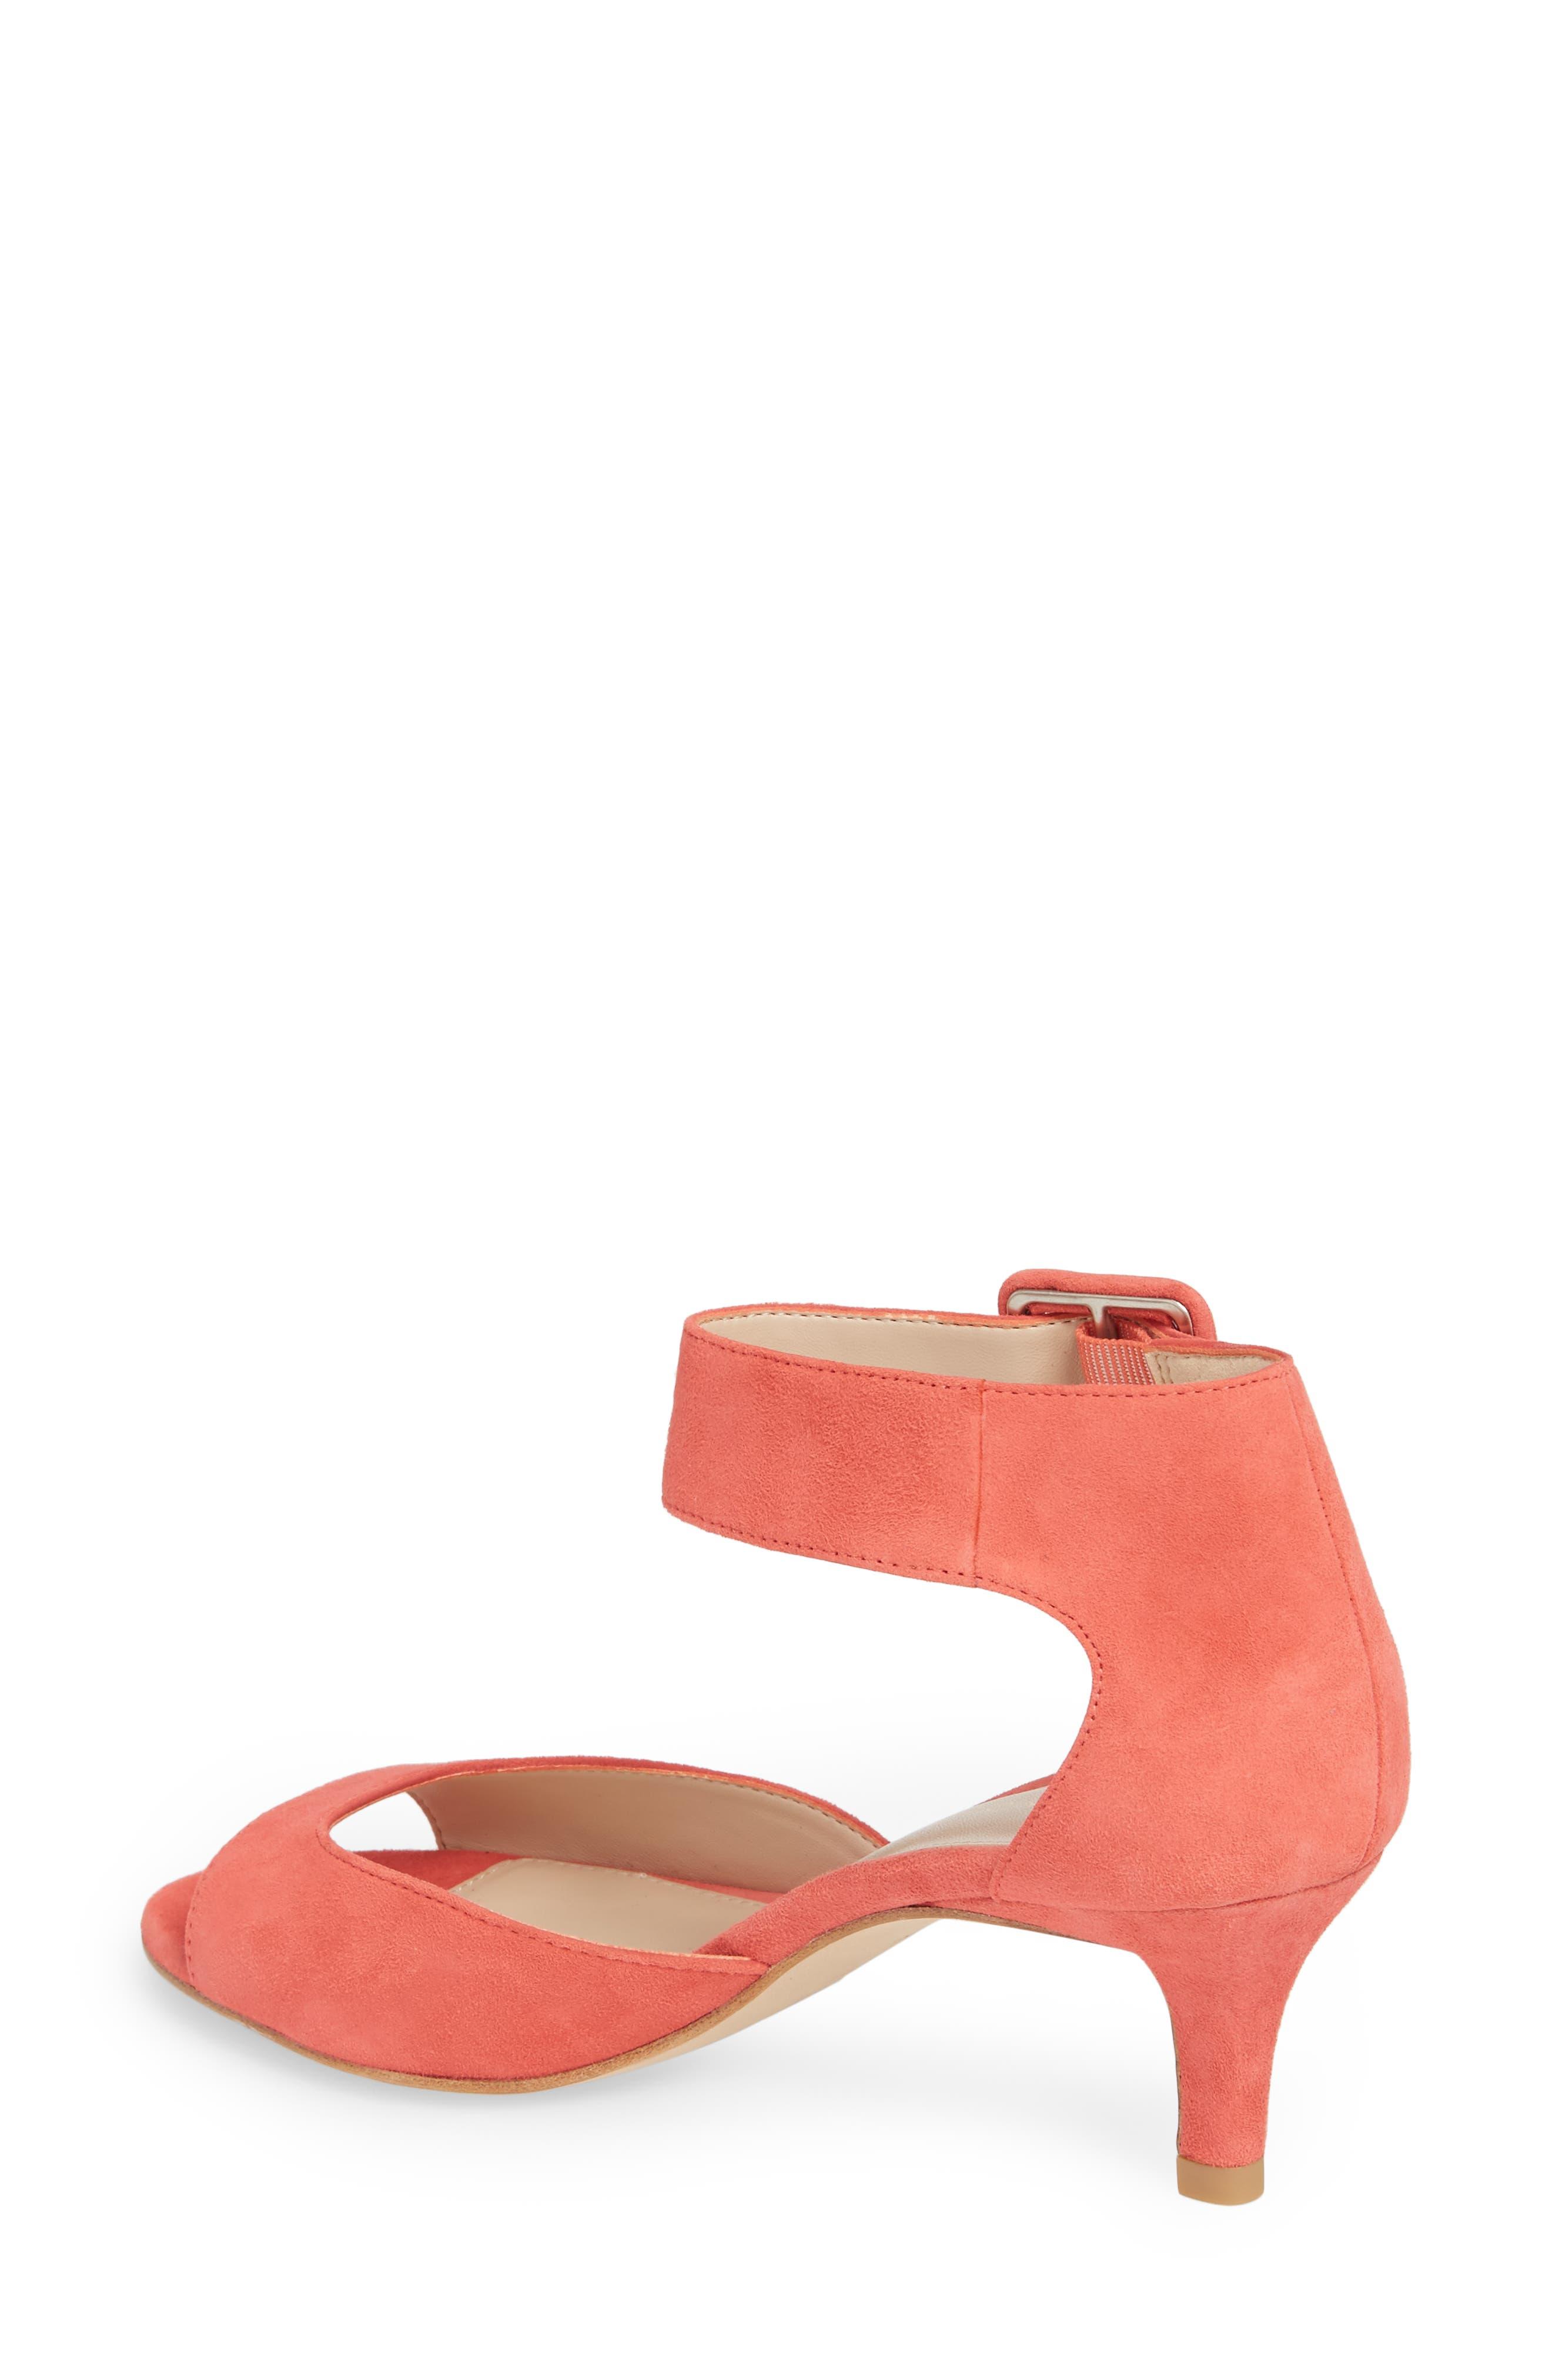 'Berlin' Ankle Strap Sandal,                             Alternate thumbnail 16, color,